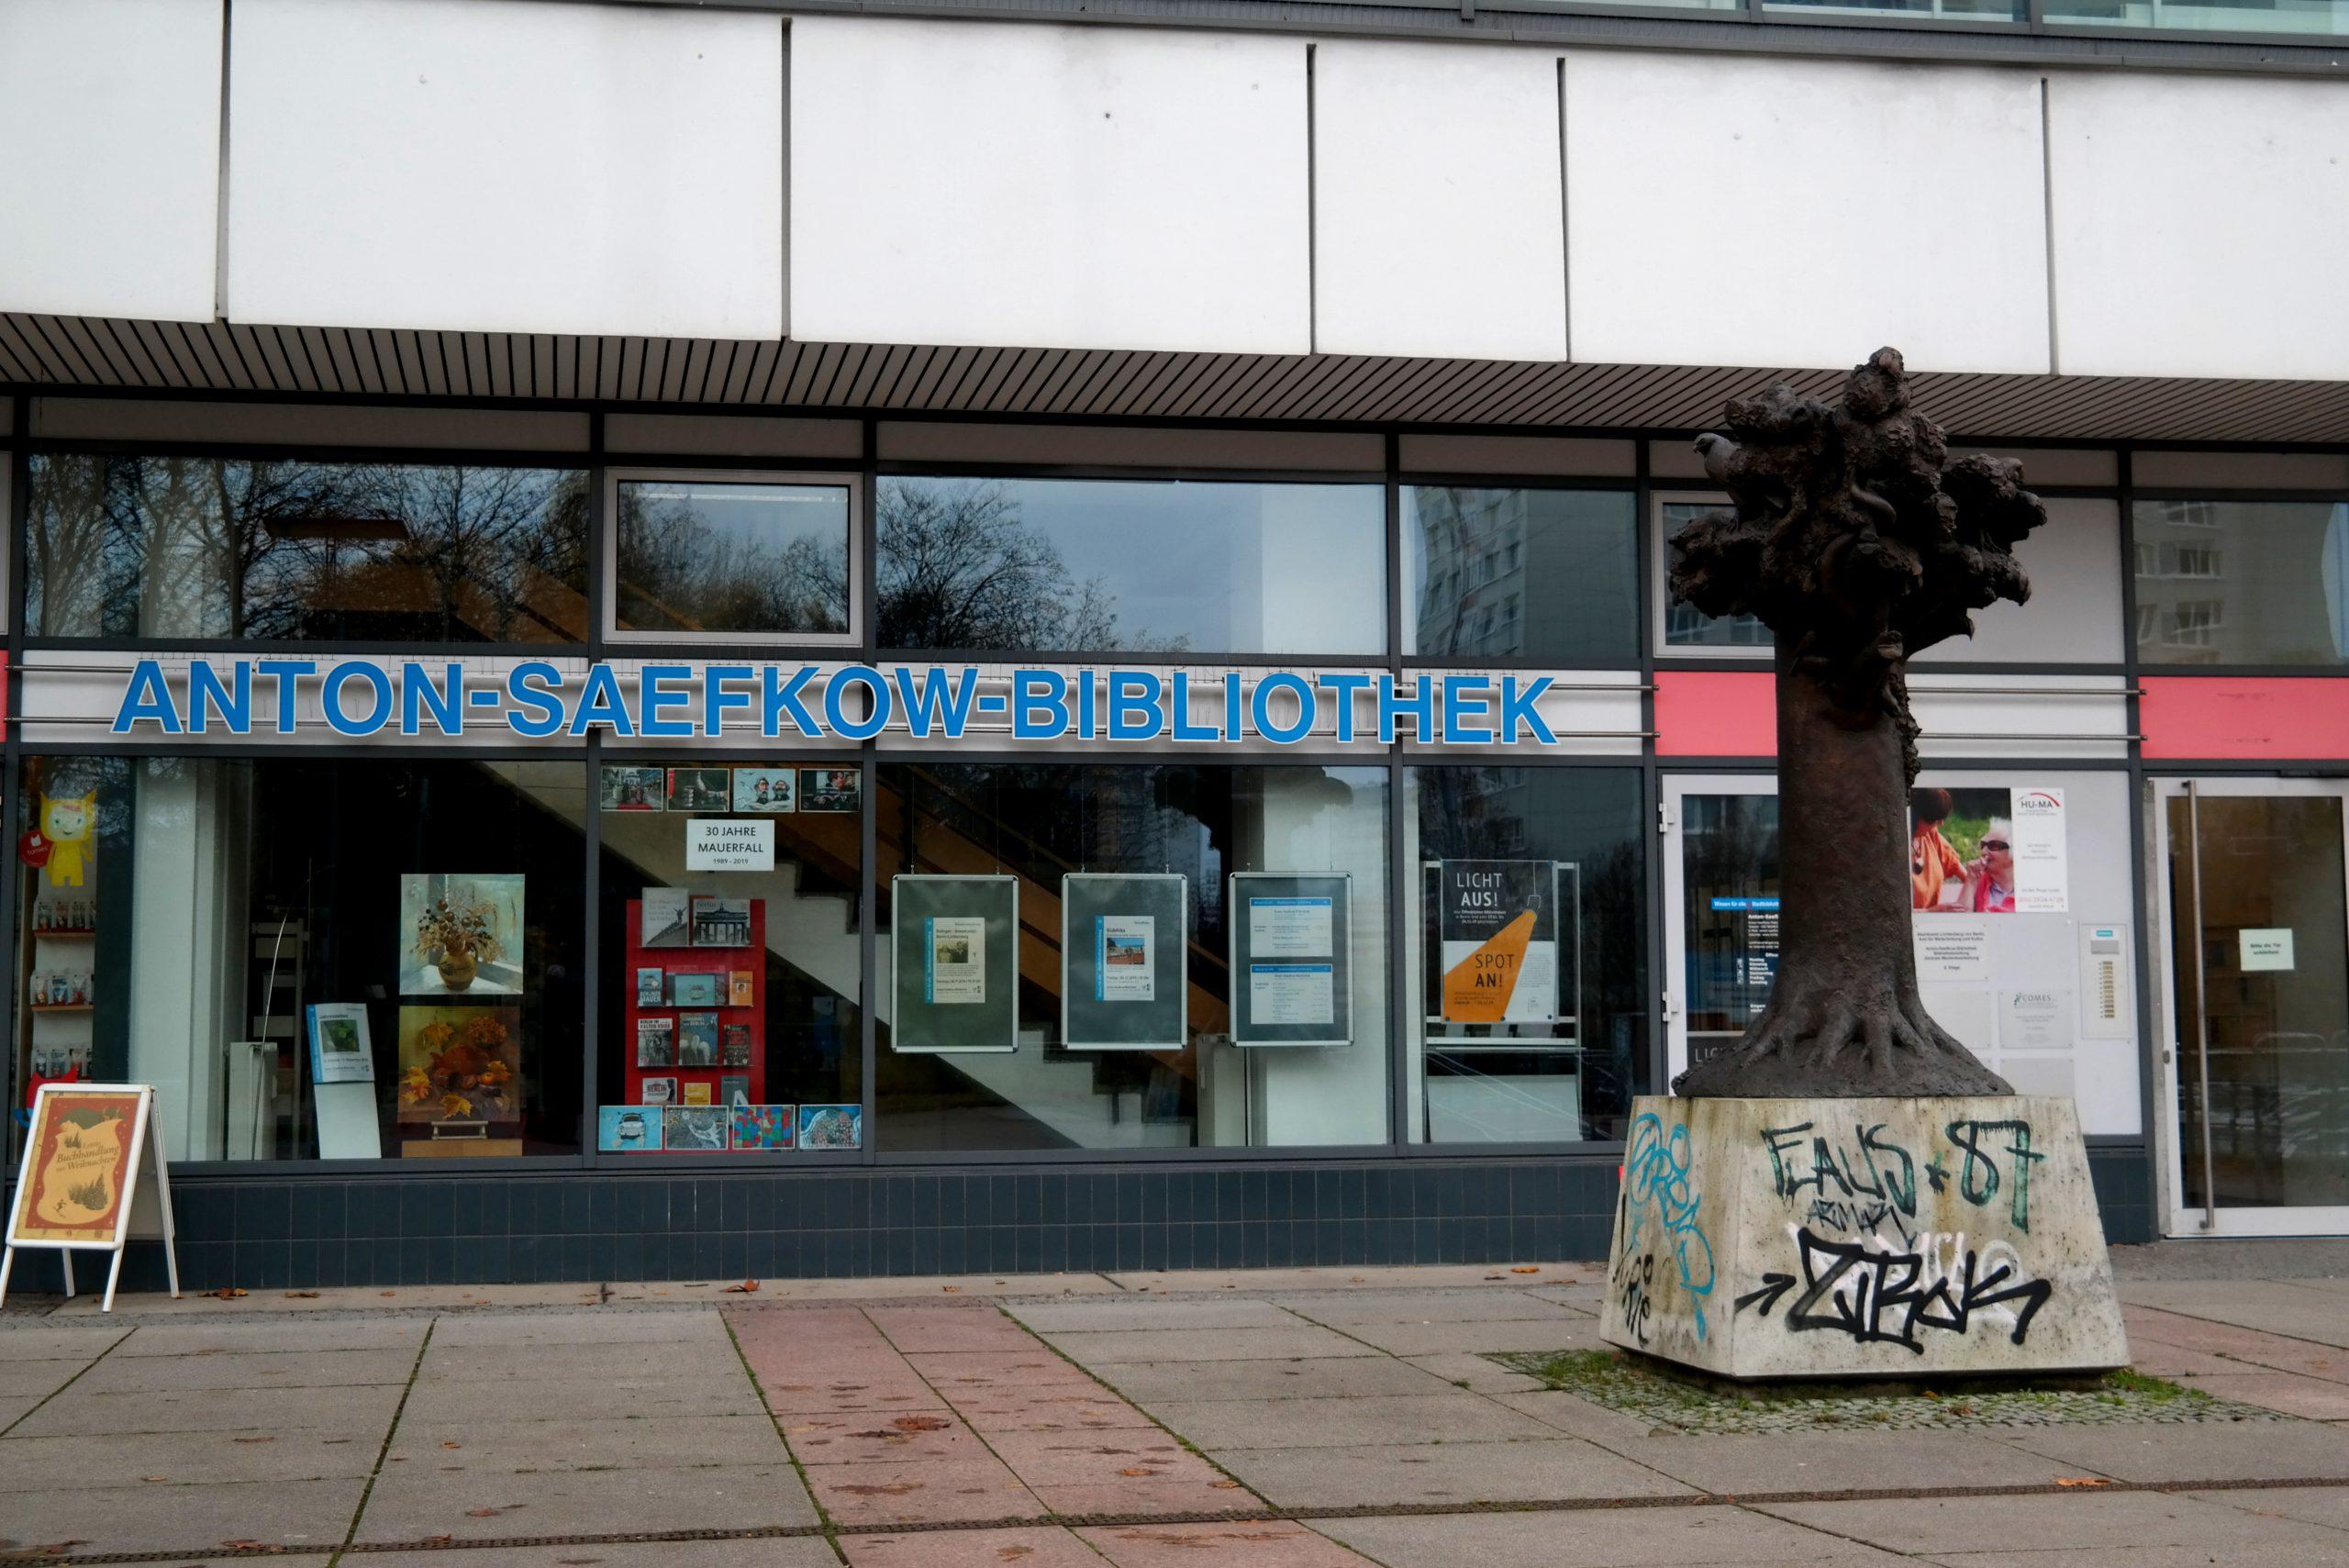 Eingang zur Anton-Saefkow-Bibliothek